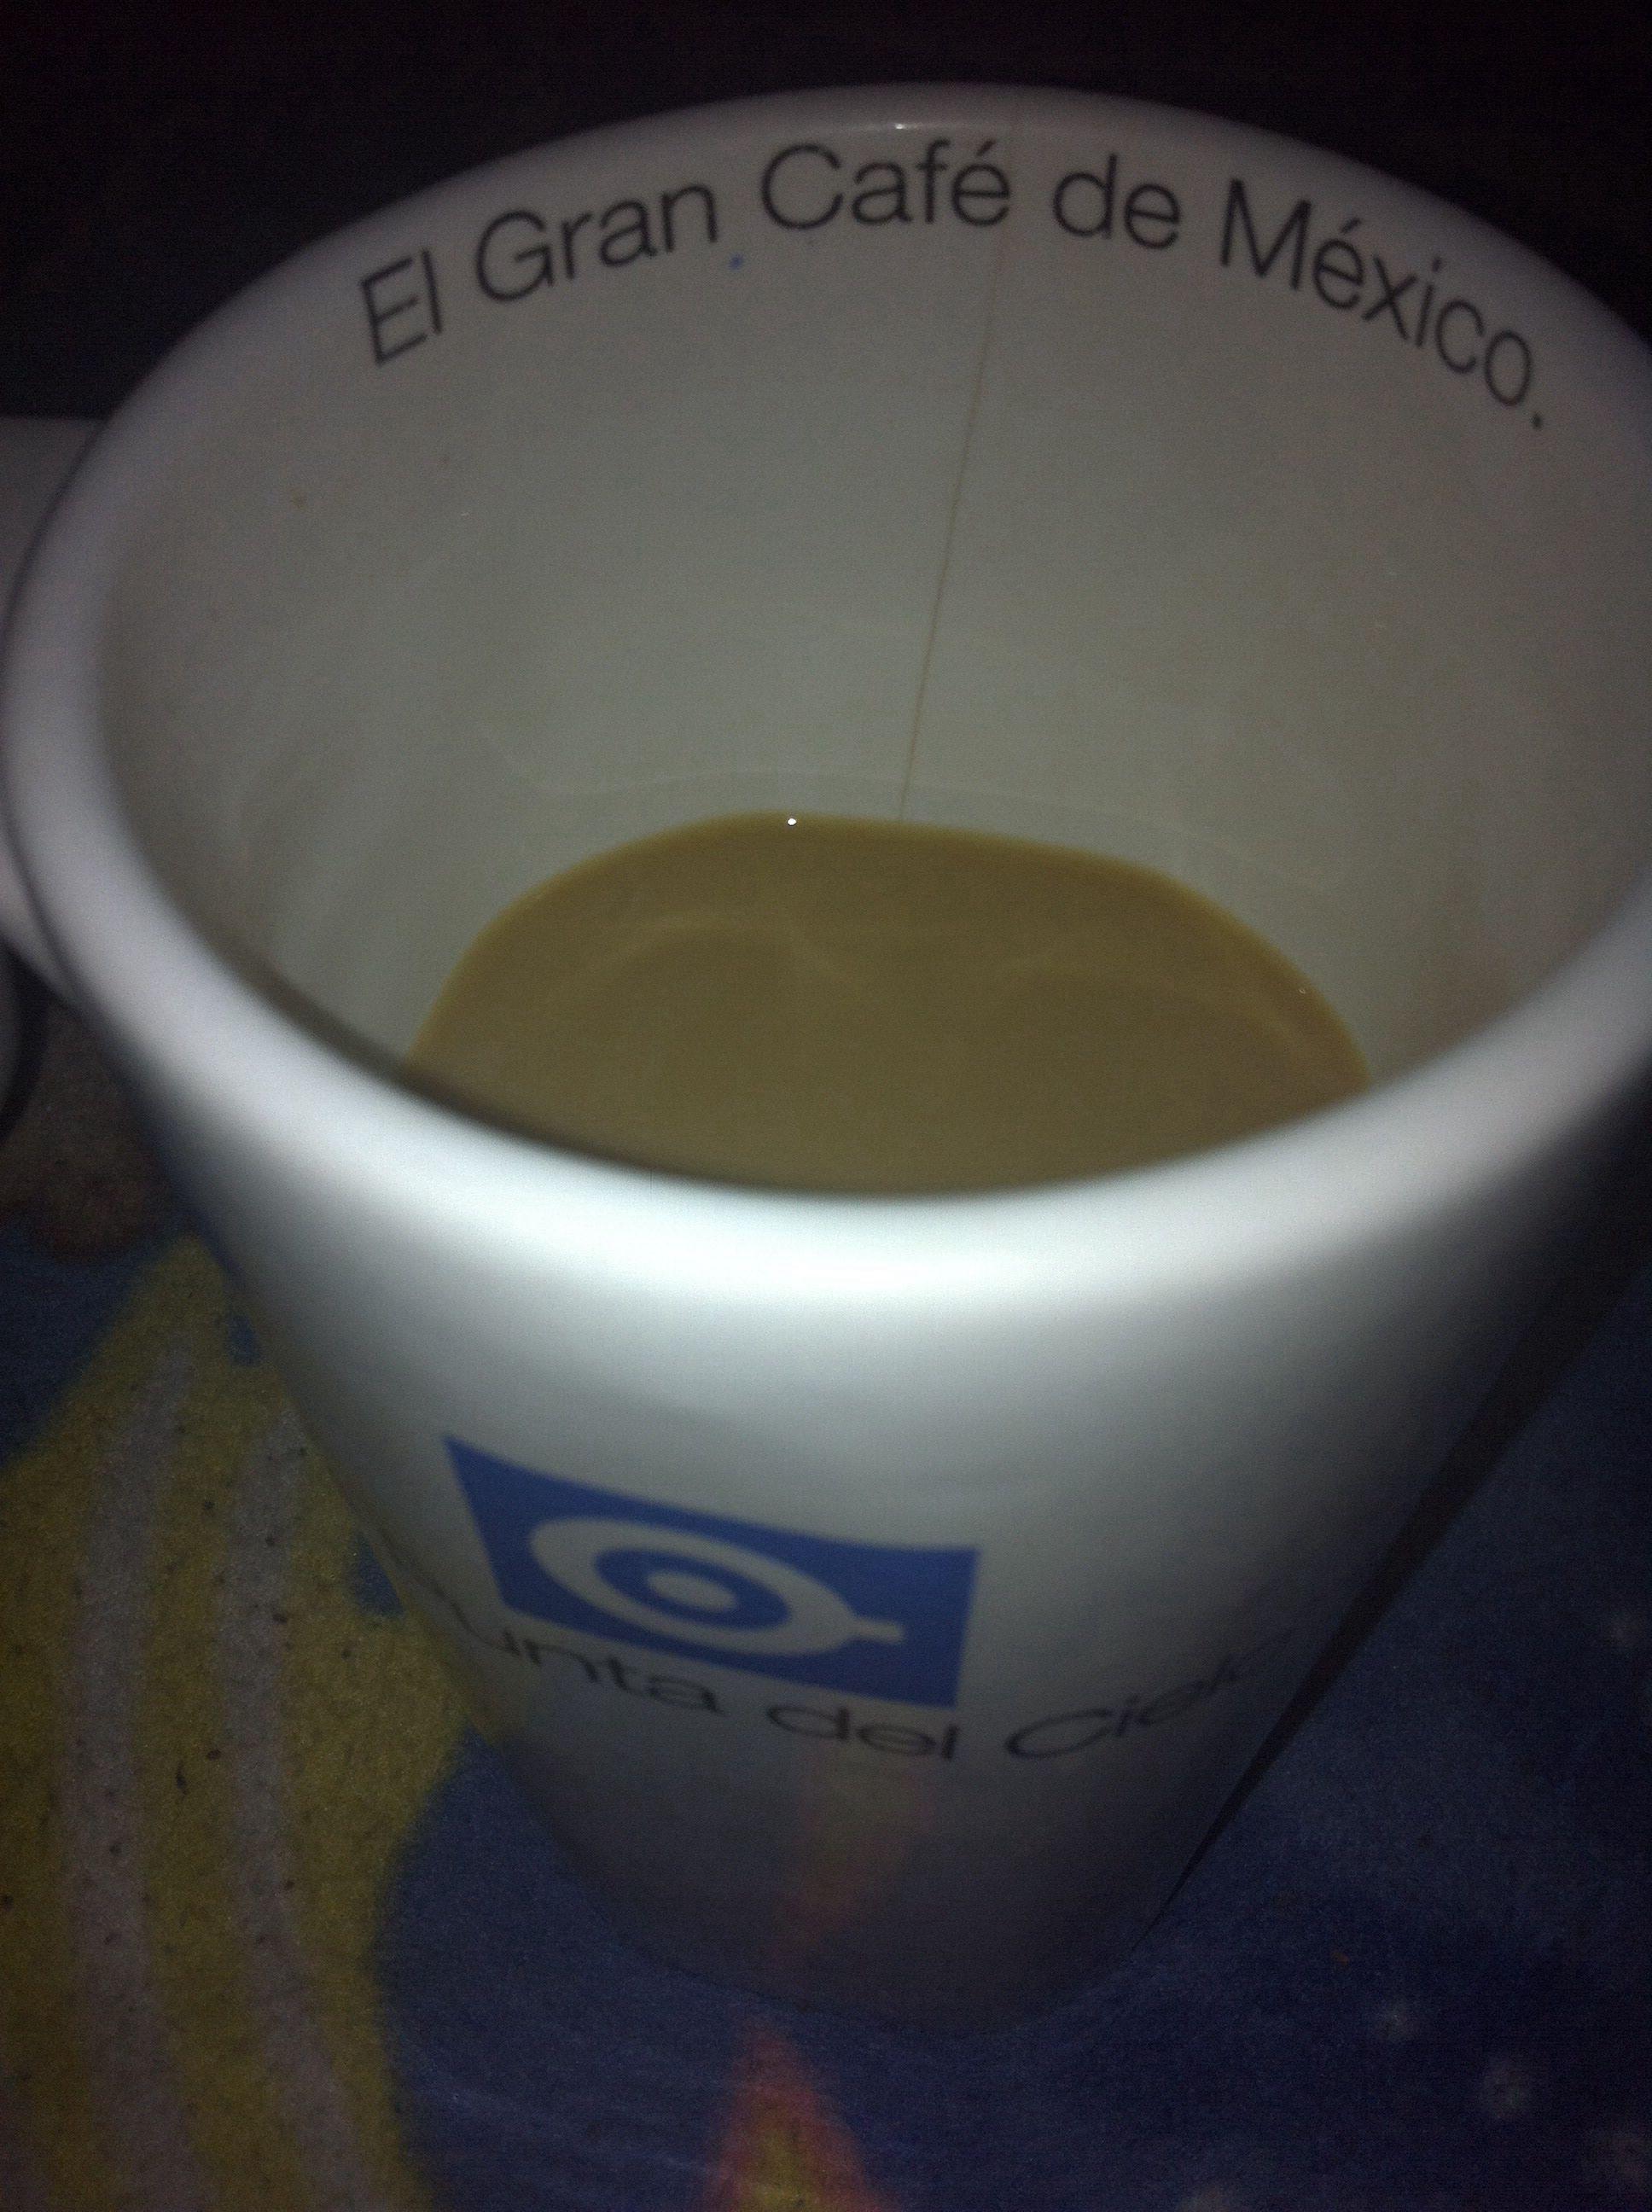 Tomando un cafecito antes de dormir